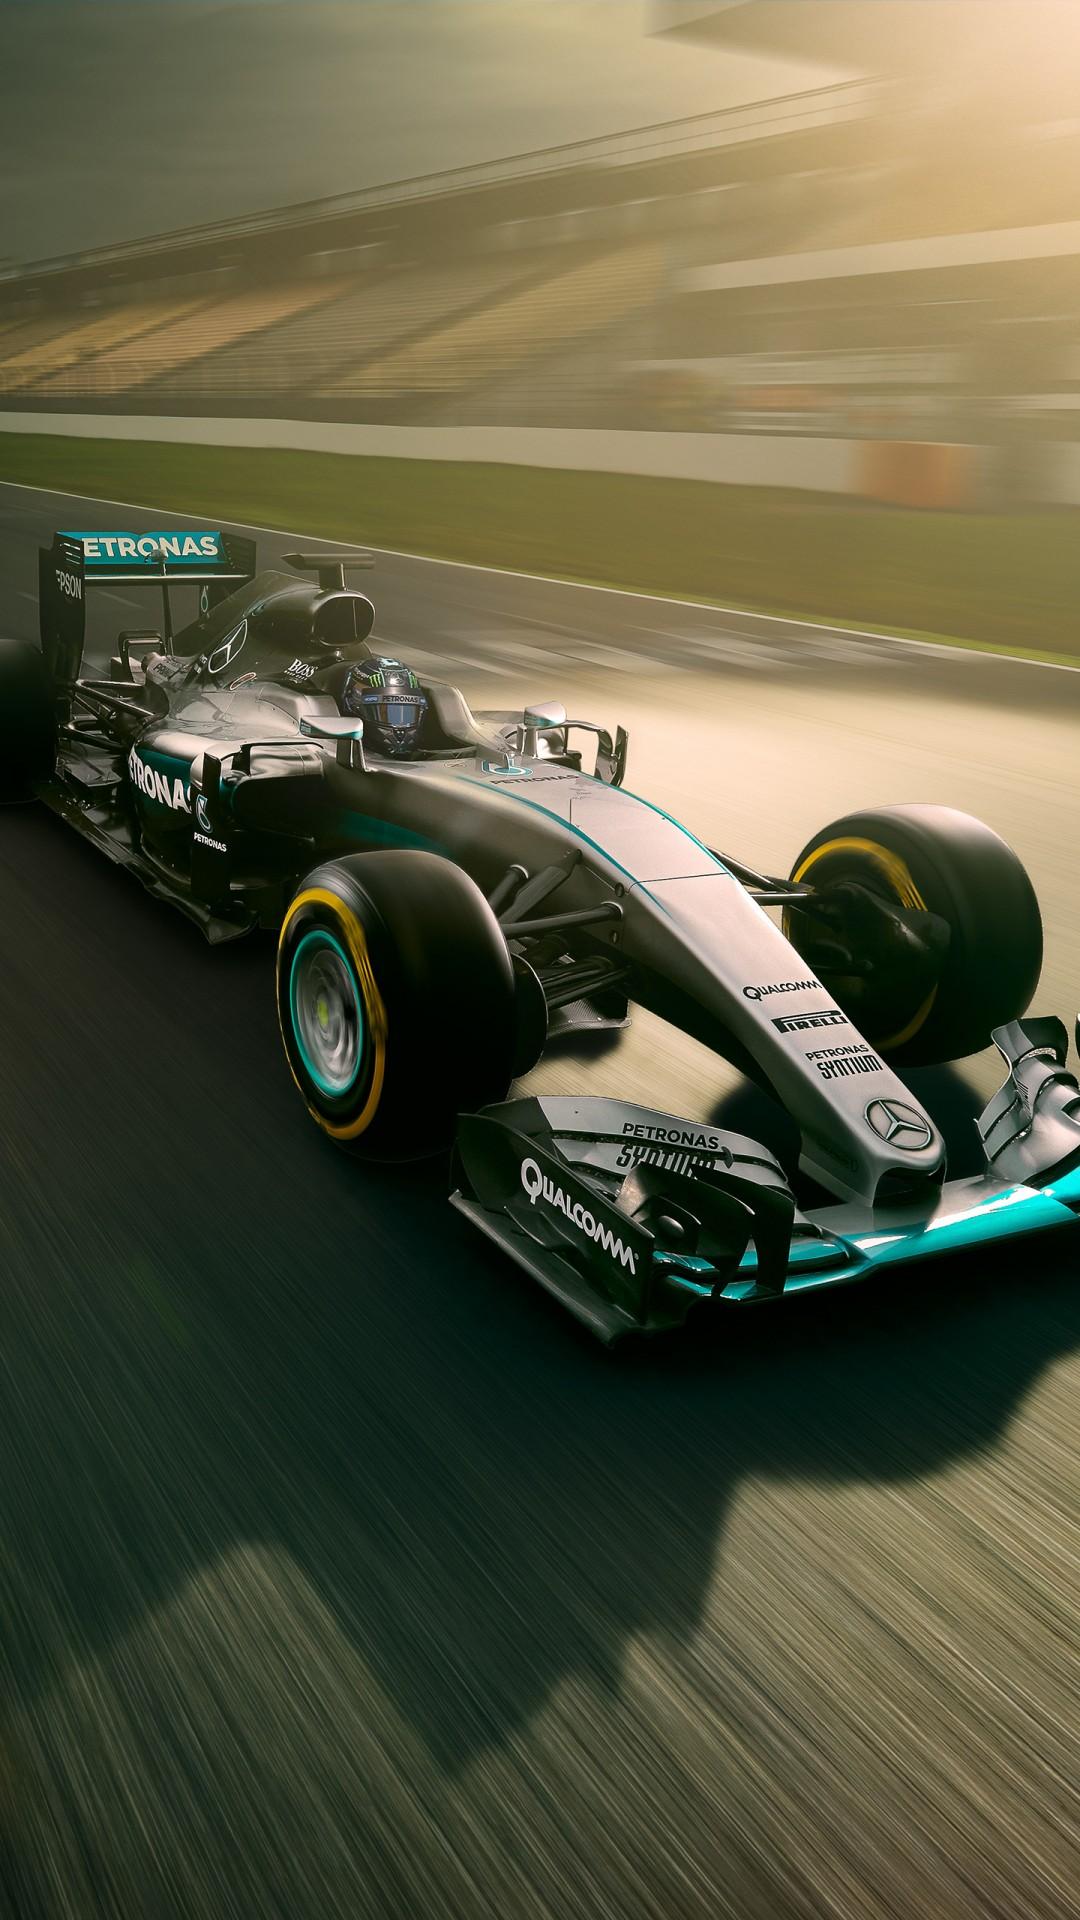 F1 Cars Wallpapers Desktop Mercedes Amg Petronas F1 Car 4k Wallpapers Hd Wallpapers